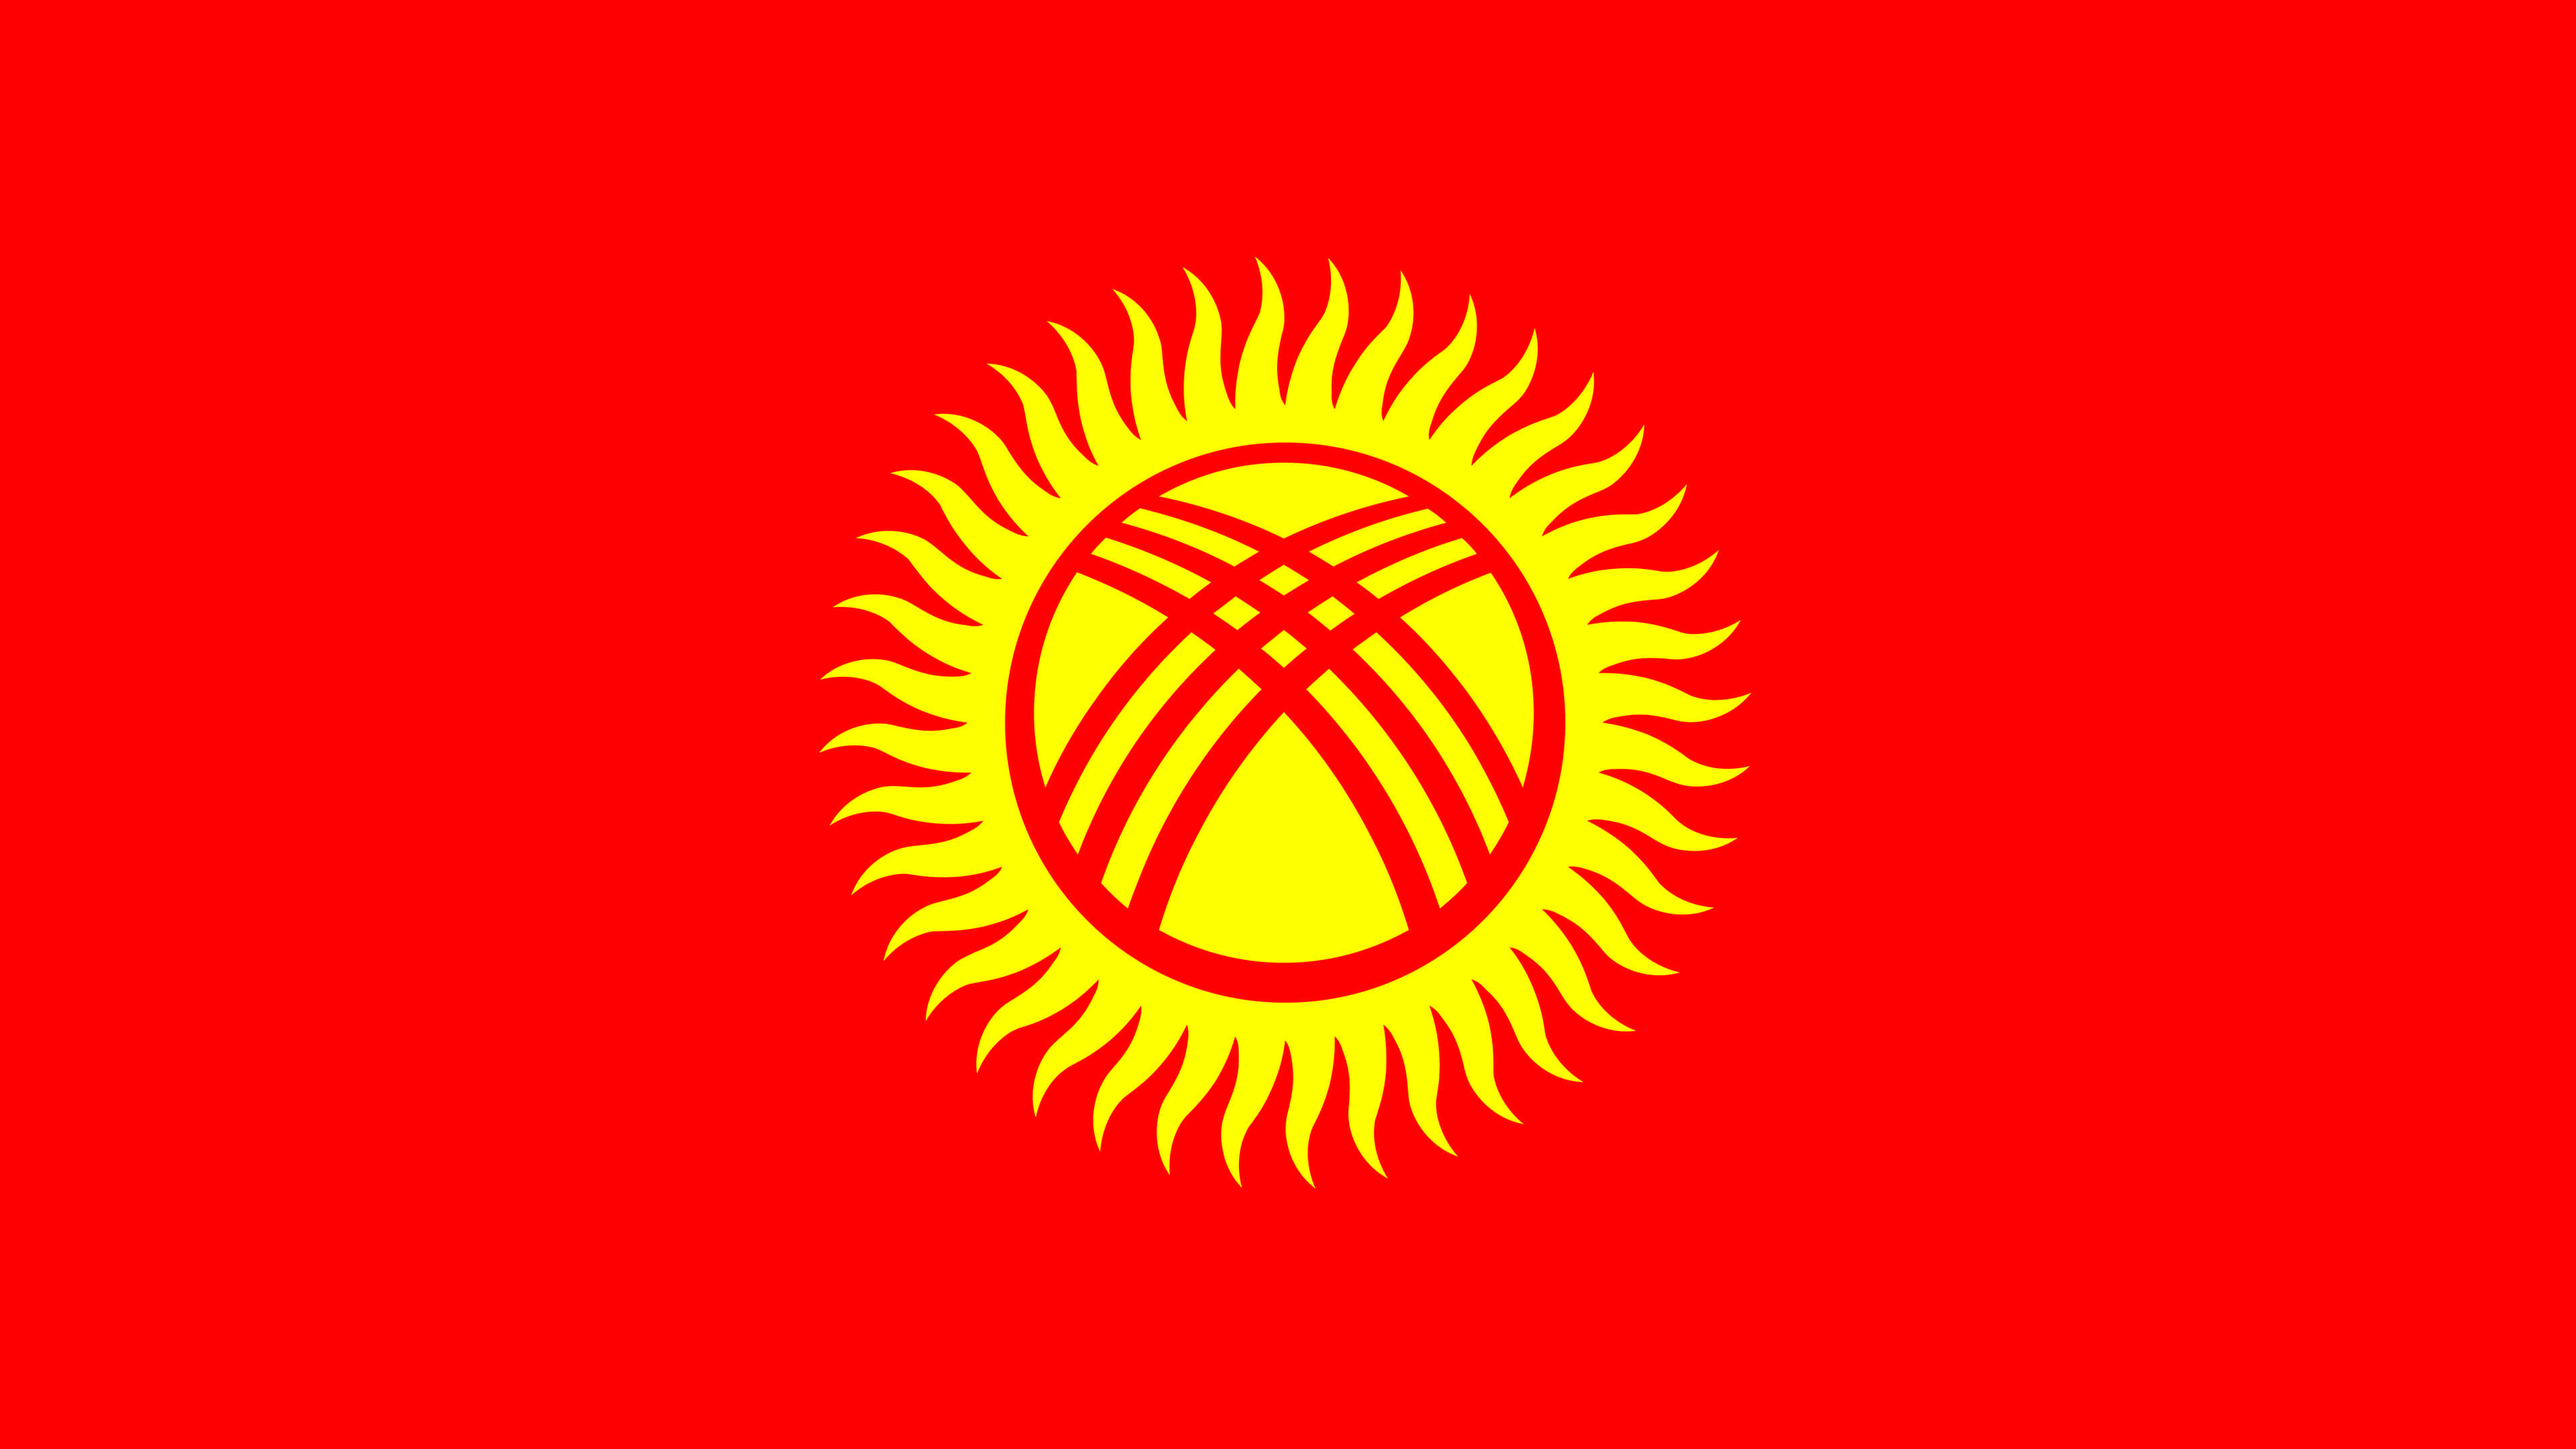 kyrgyzstan flag uhd 4k wallpaper